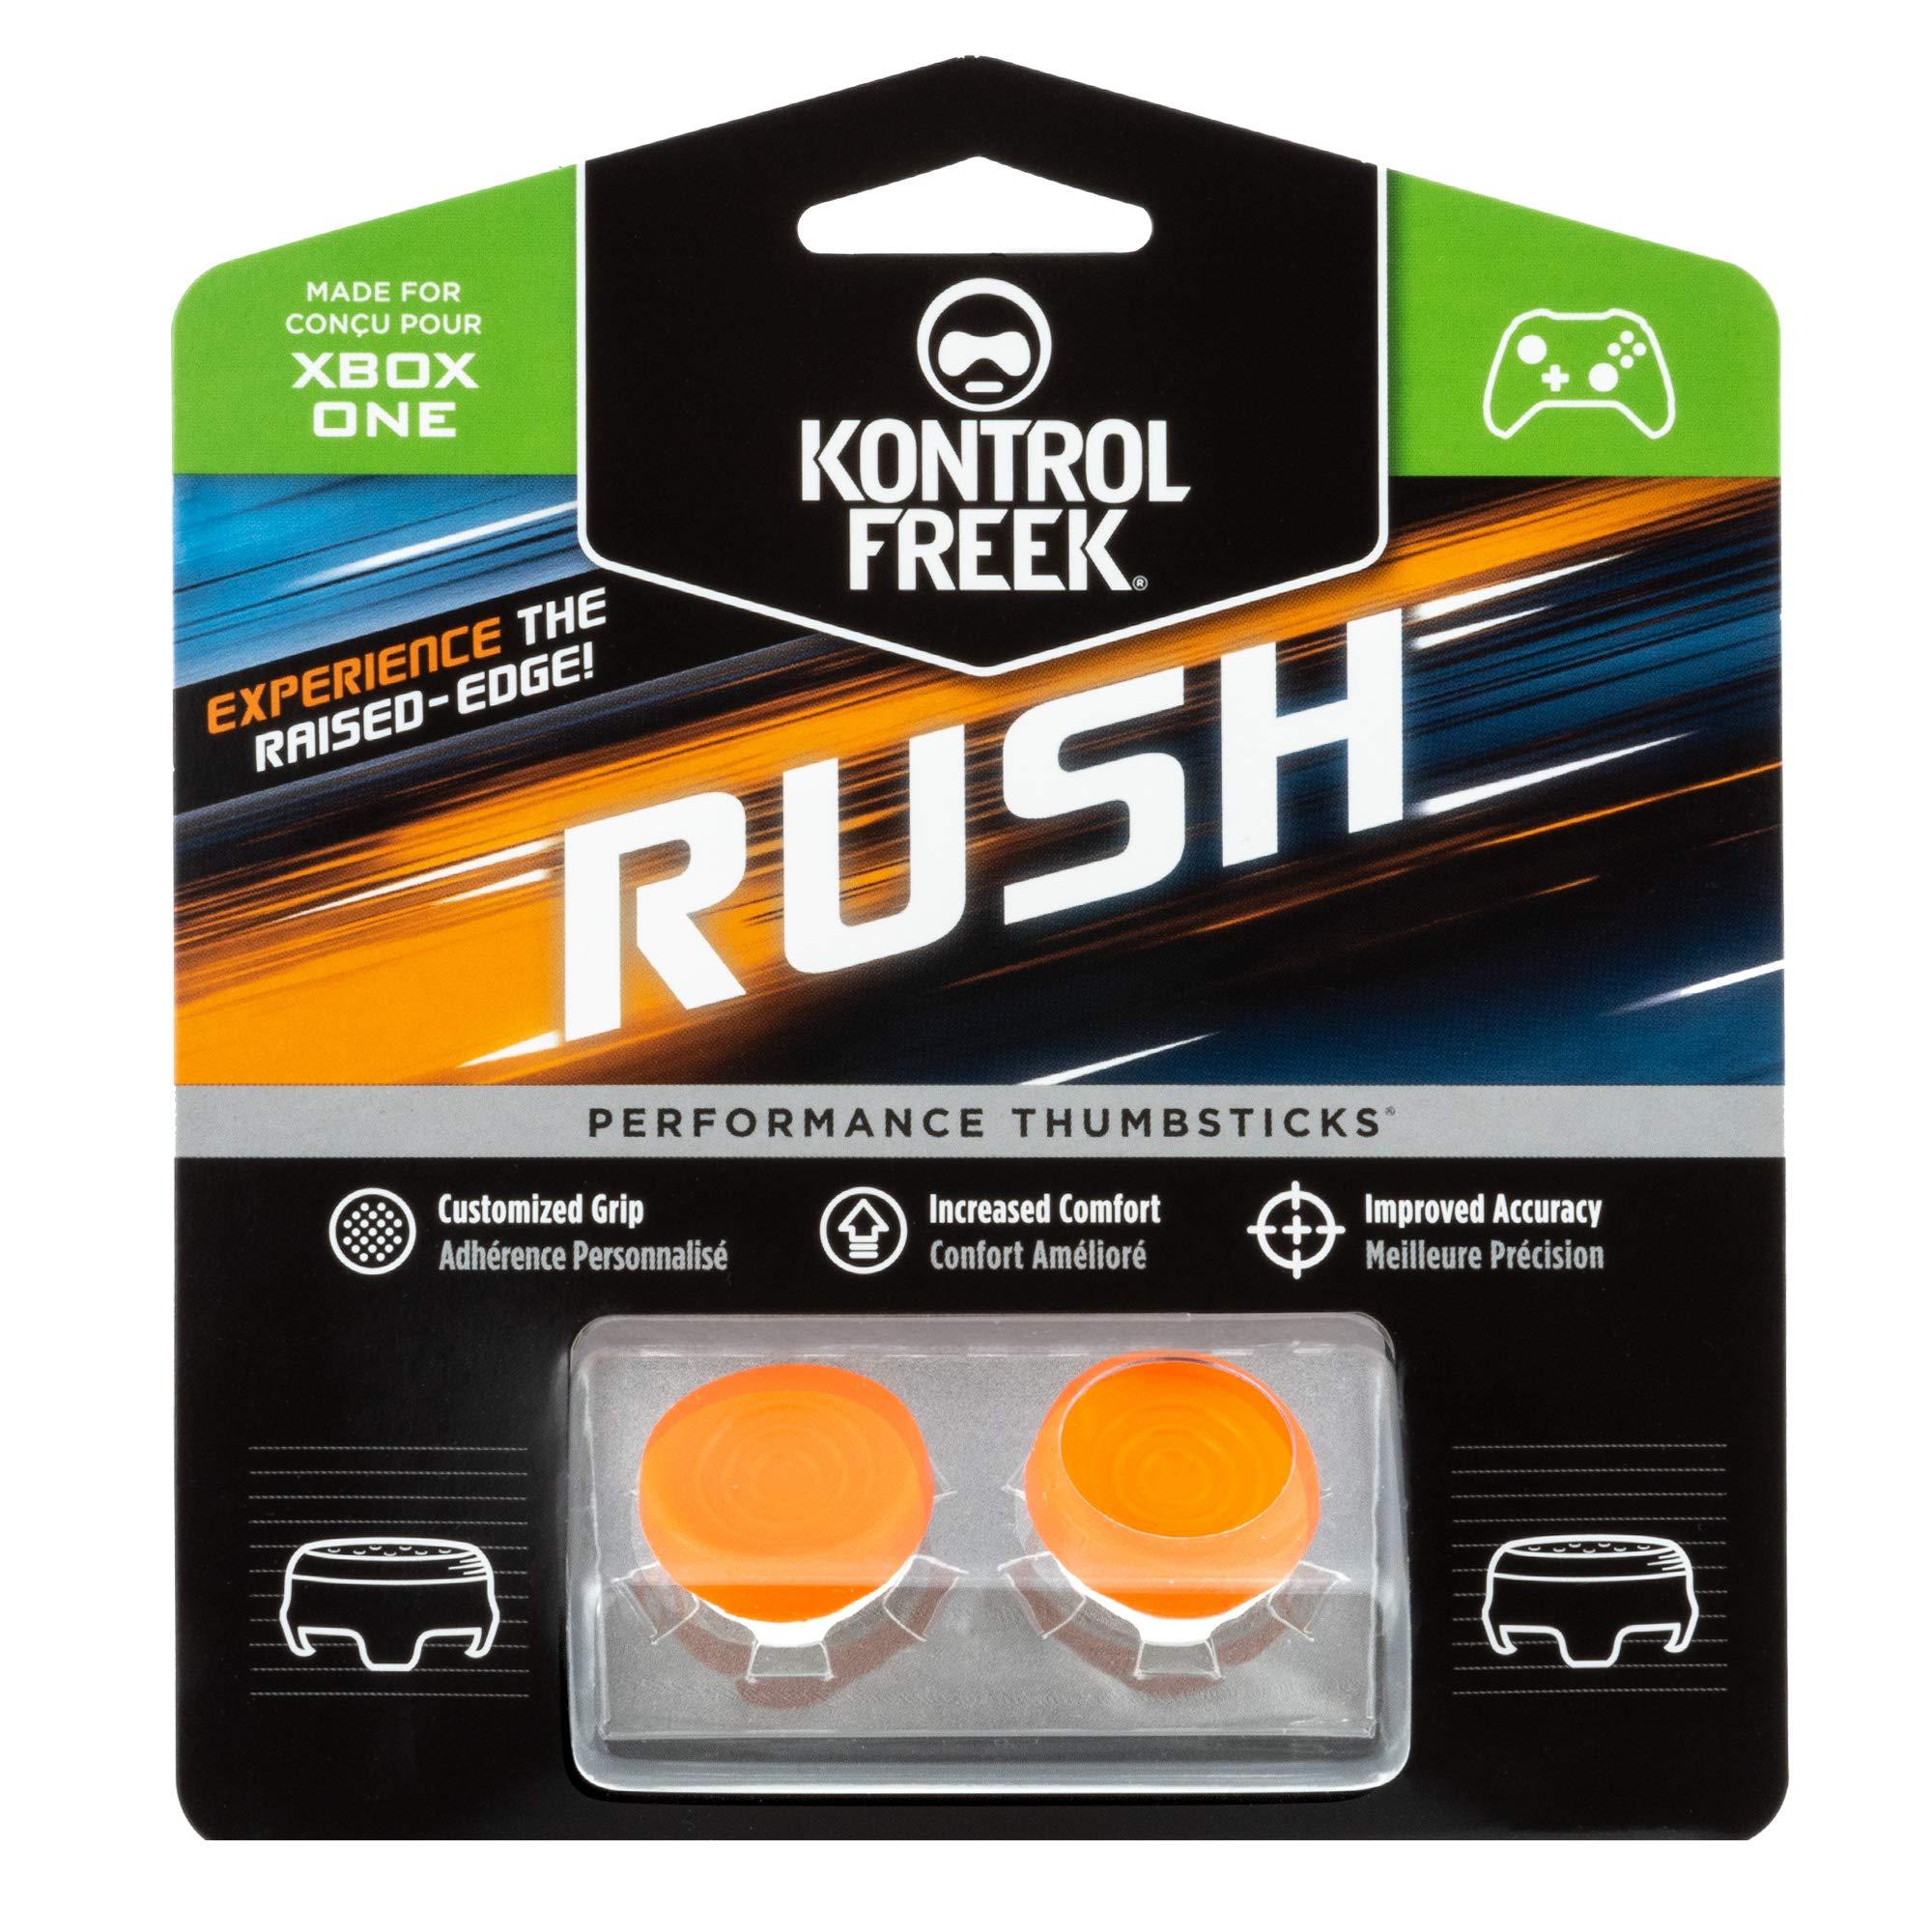 KontrolFreek Rush Performance Thumbsticks for Xbox One | Performance Thumbsticks | 2 Mid-Rise, Concave | Orange/White by KontrolFreek